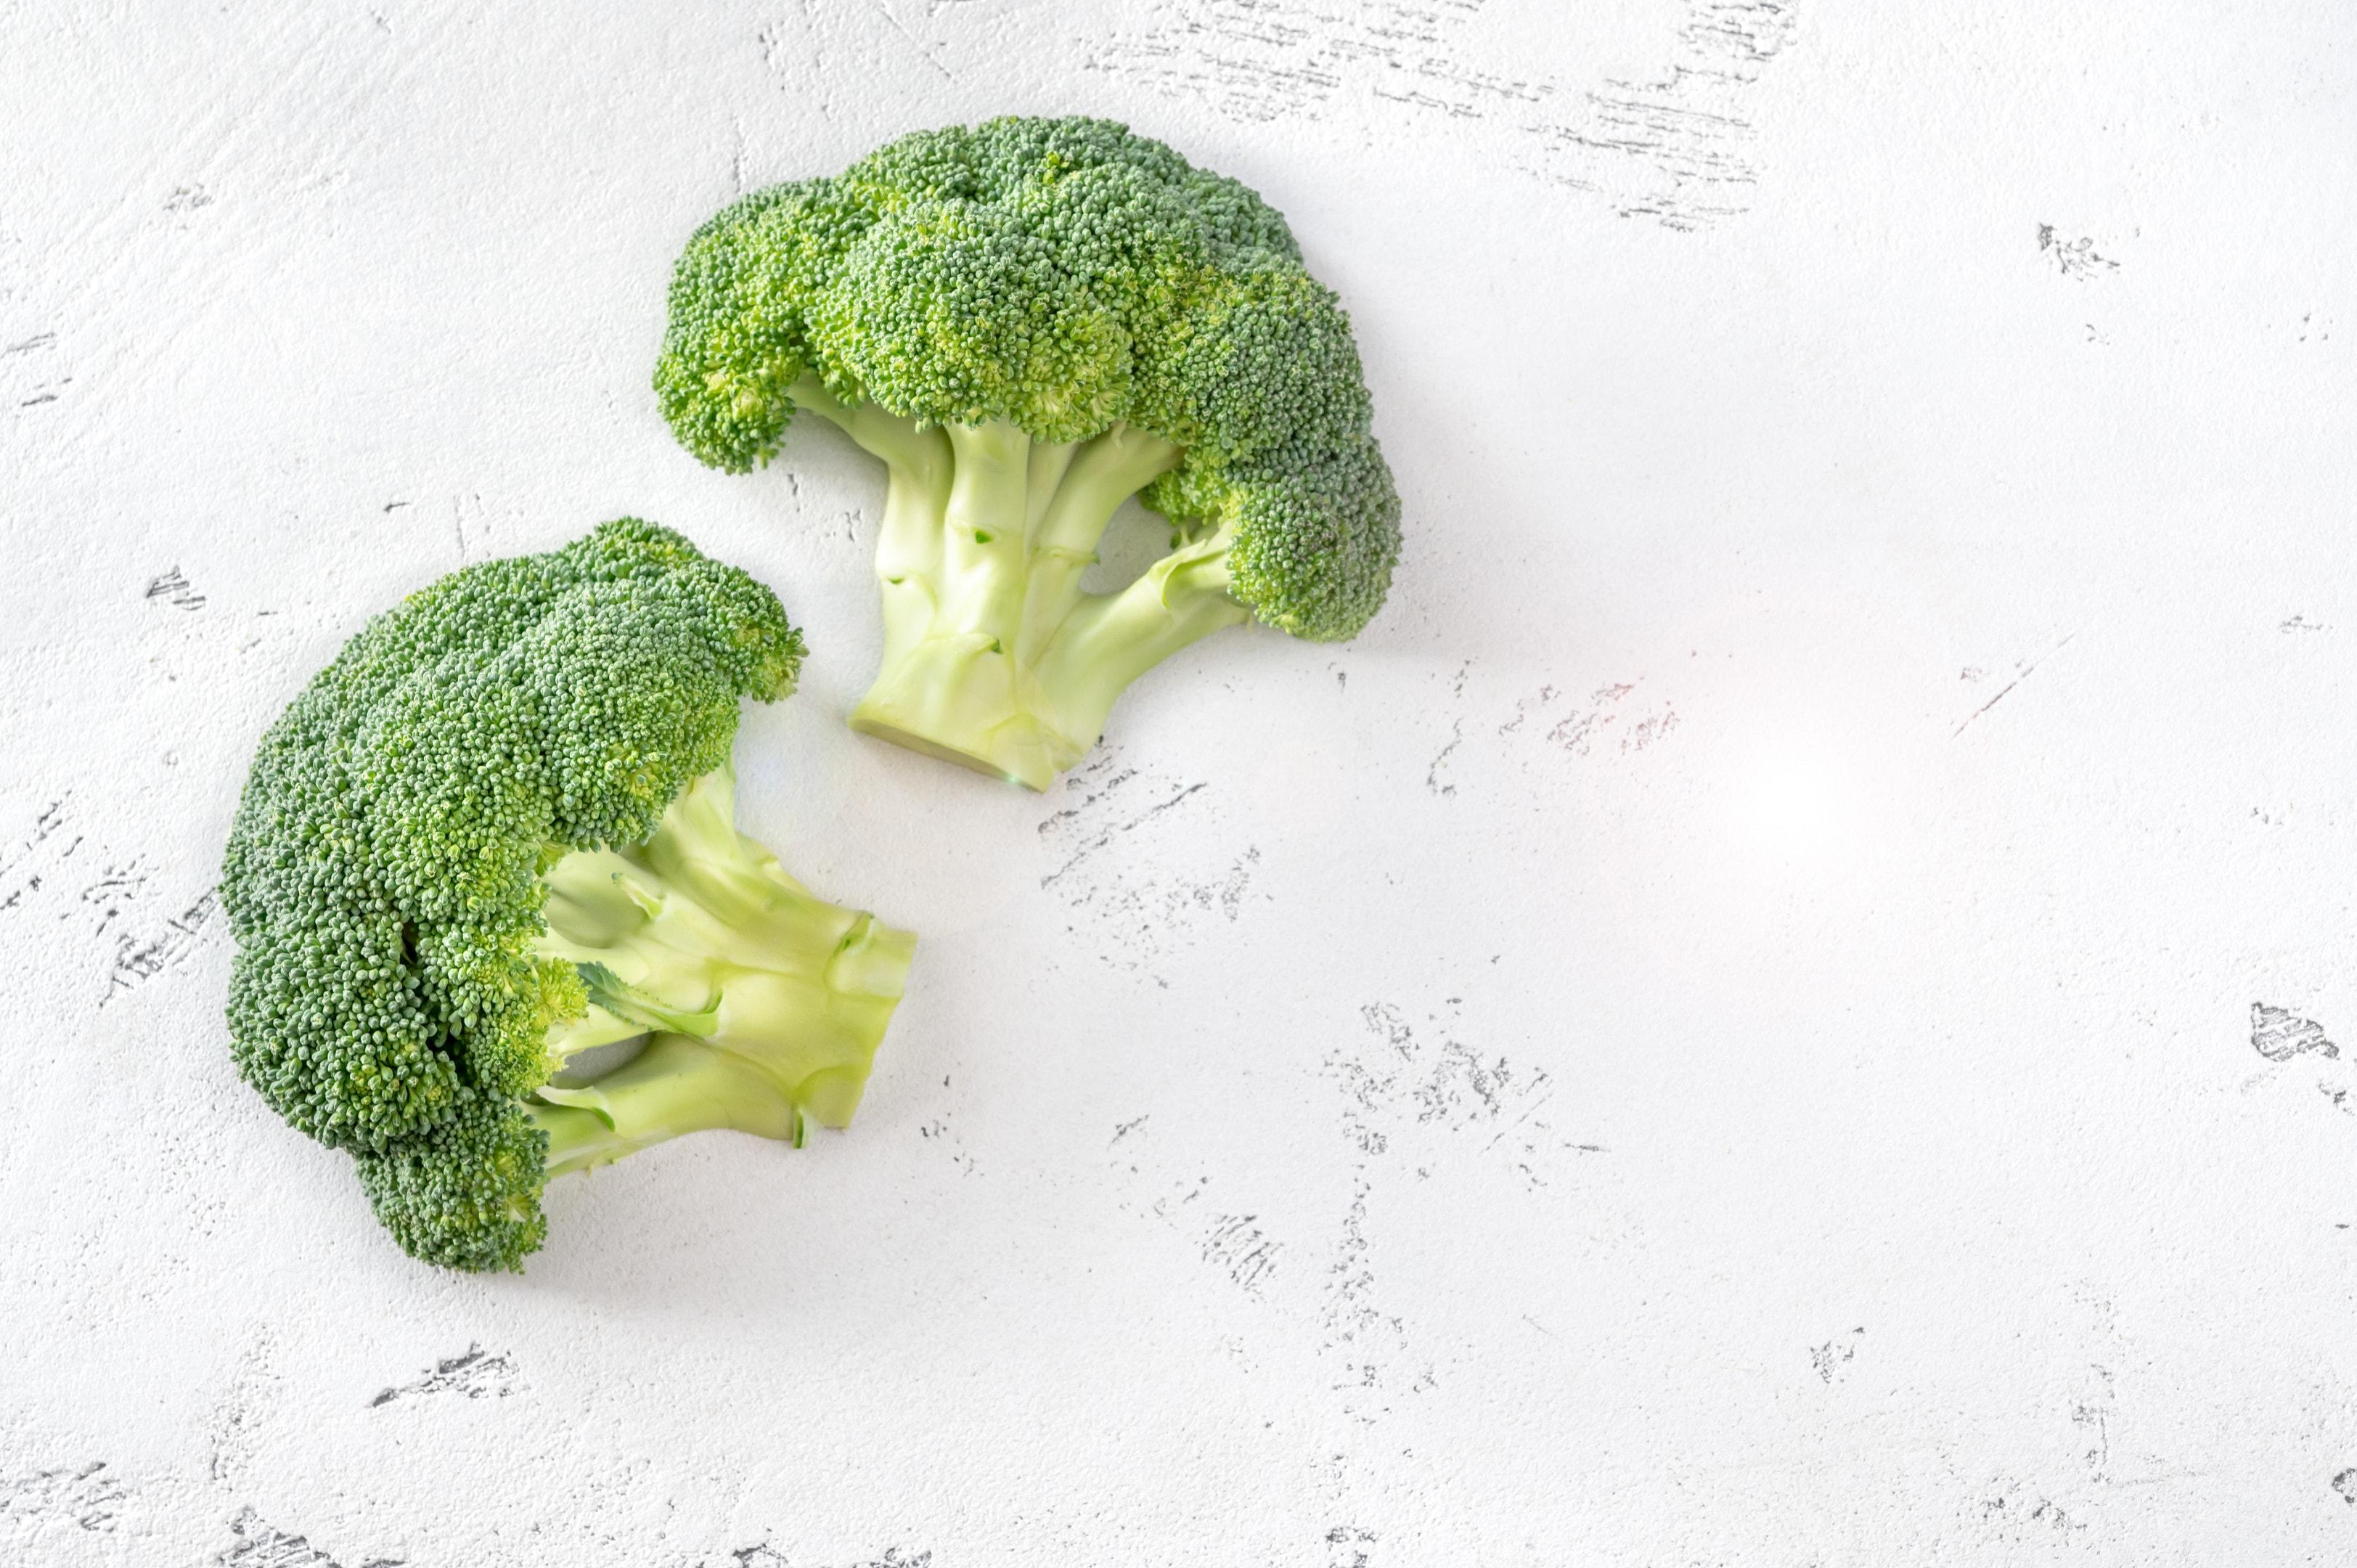 Fresh Broccoli on White Wooden Background